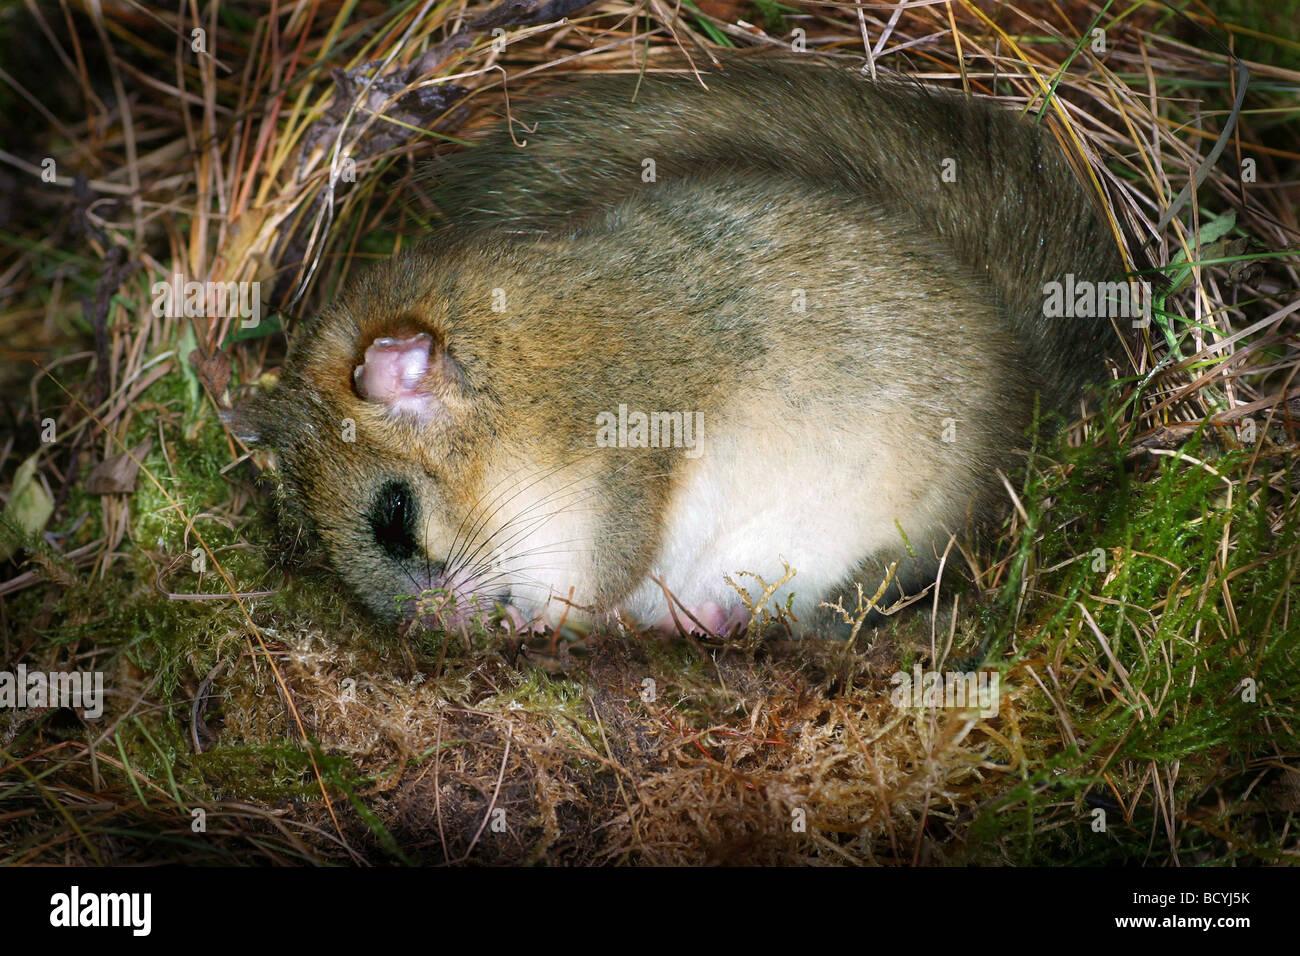 Common Dormouse, Hazel Dormouse (Muscardinus avellanarius) sleeping in its nest during hibernation. - Stock Image